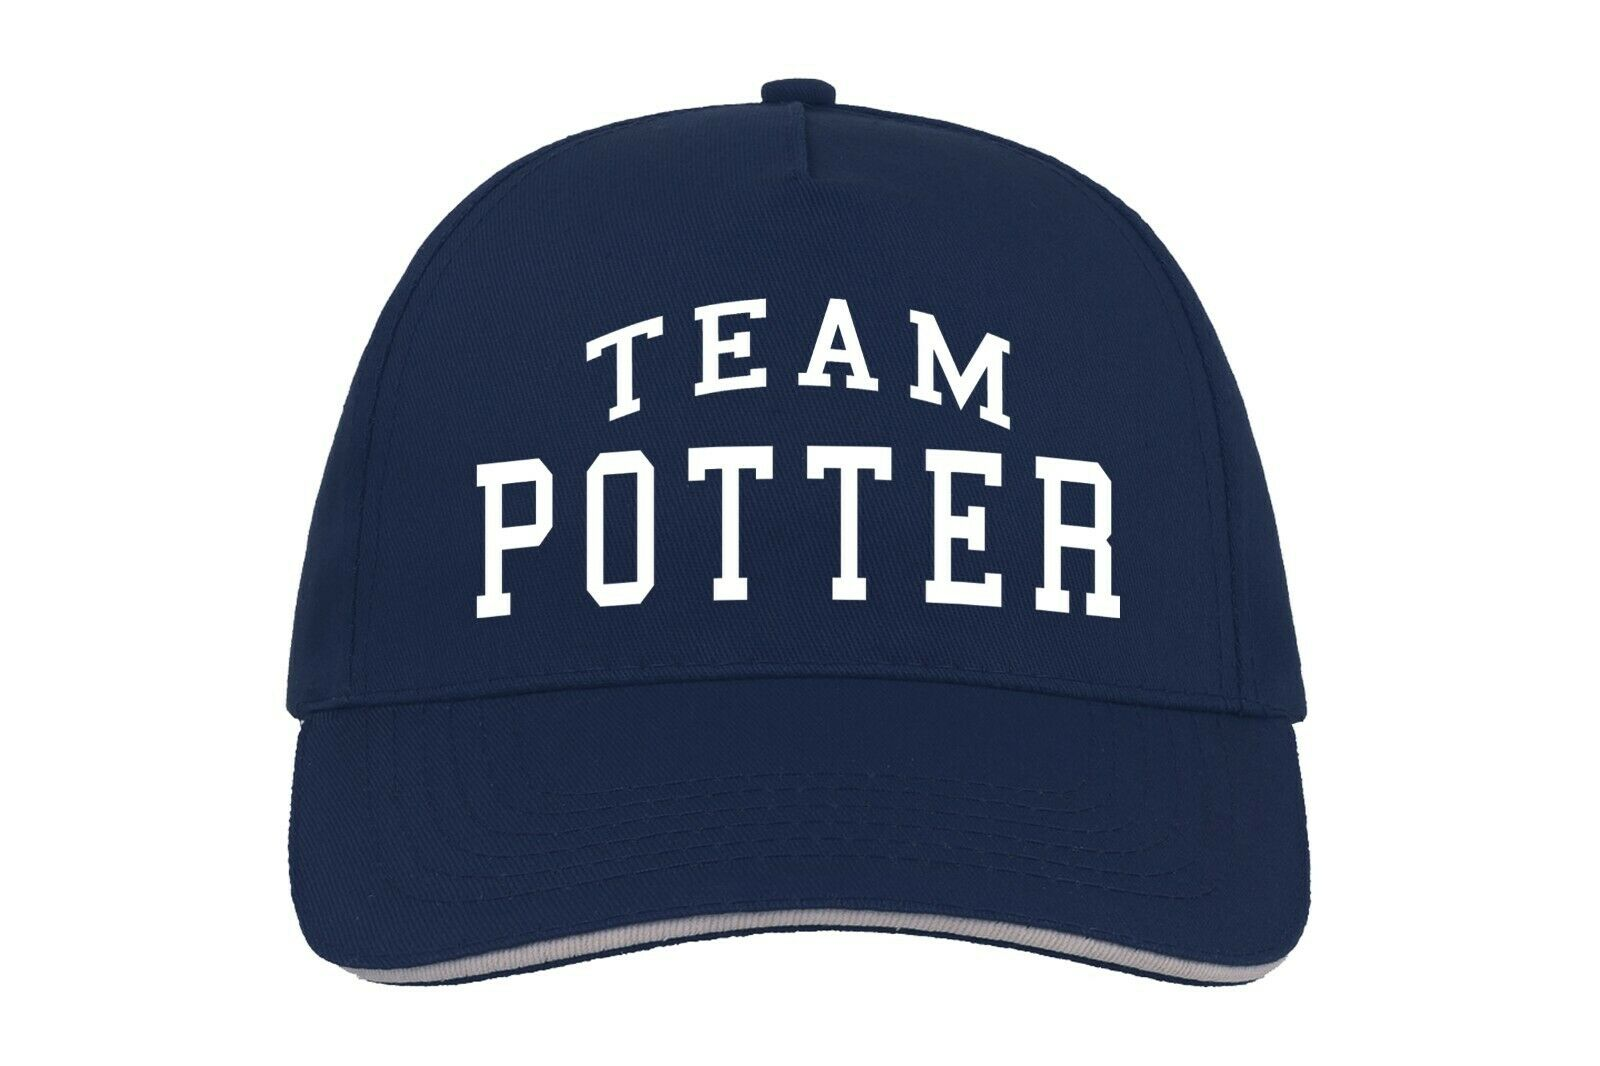 Team Potter Baseballkappe Kappe Geschenk Familienname Familie Name Cool